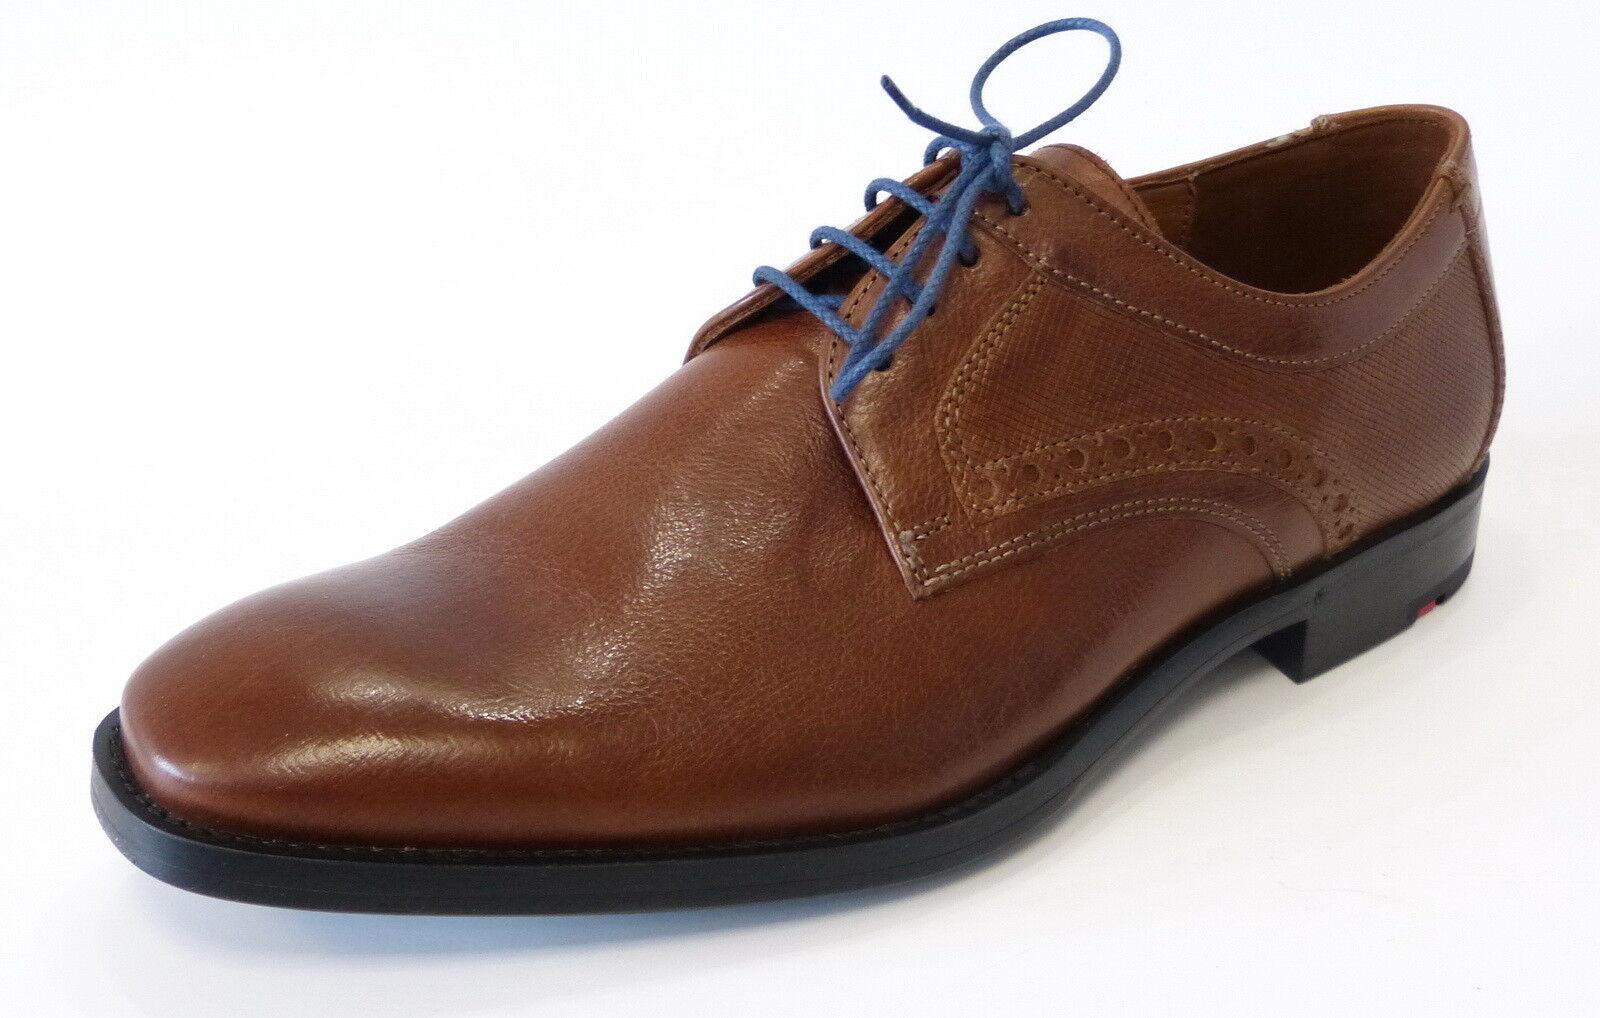 Lloyd Business Schnür Schuh Dolan 27-583-11 reh braun blau Leder Gummisohle